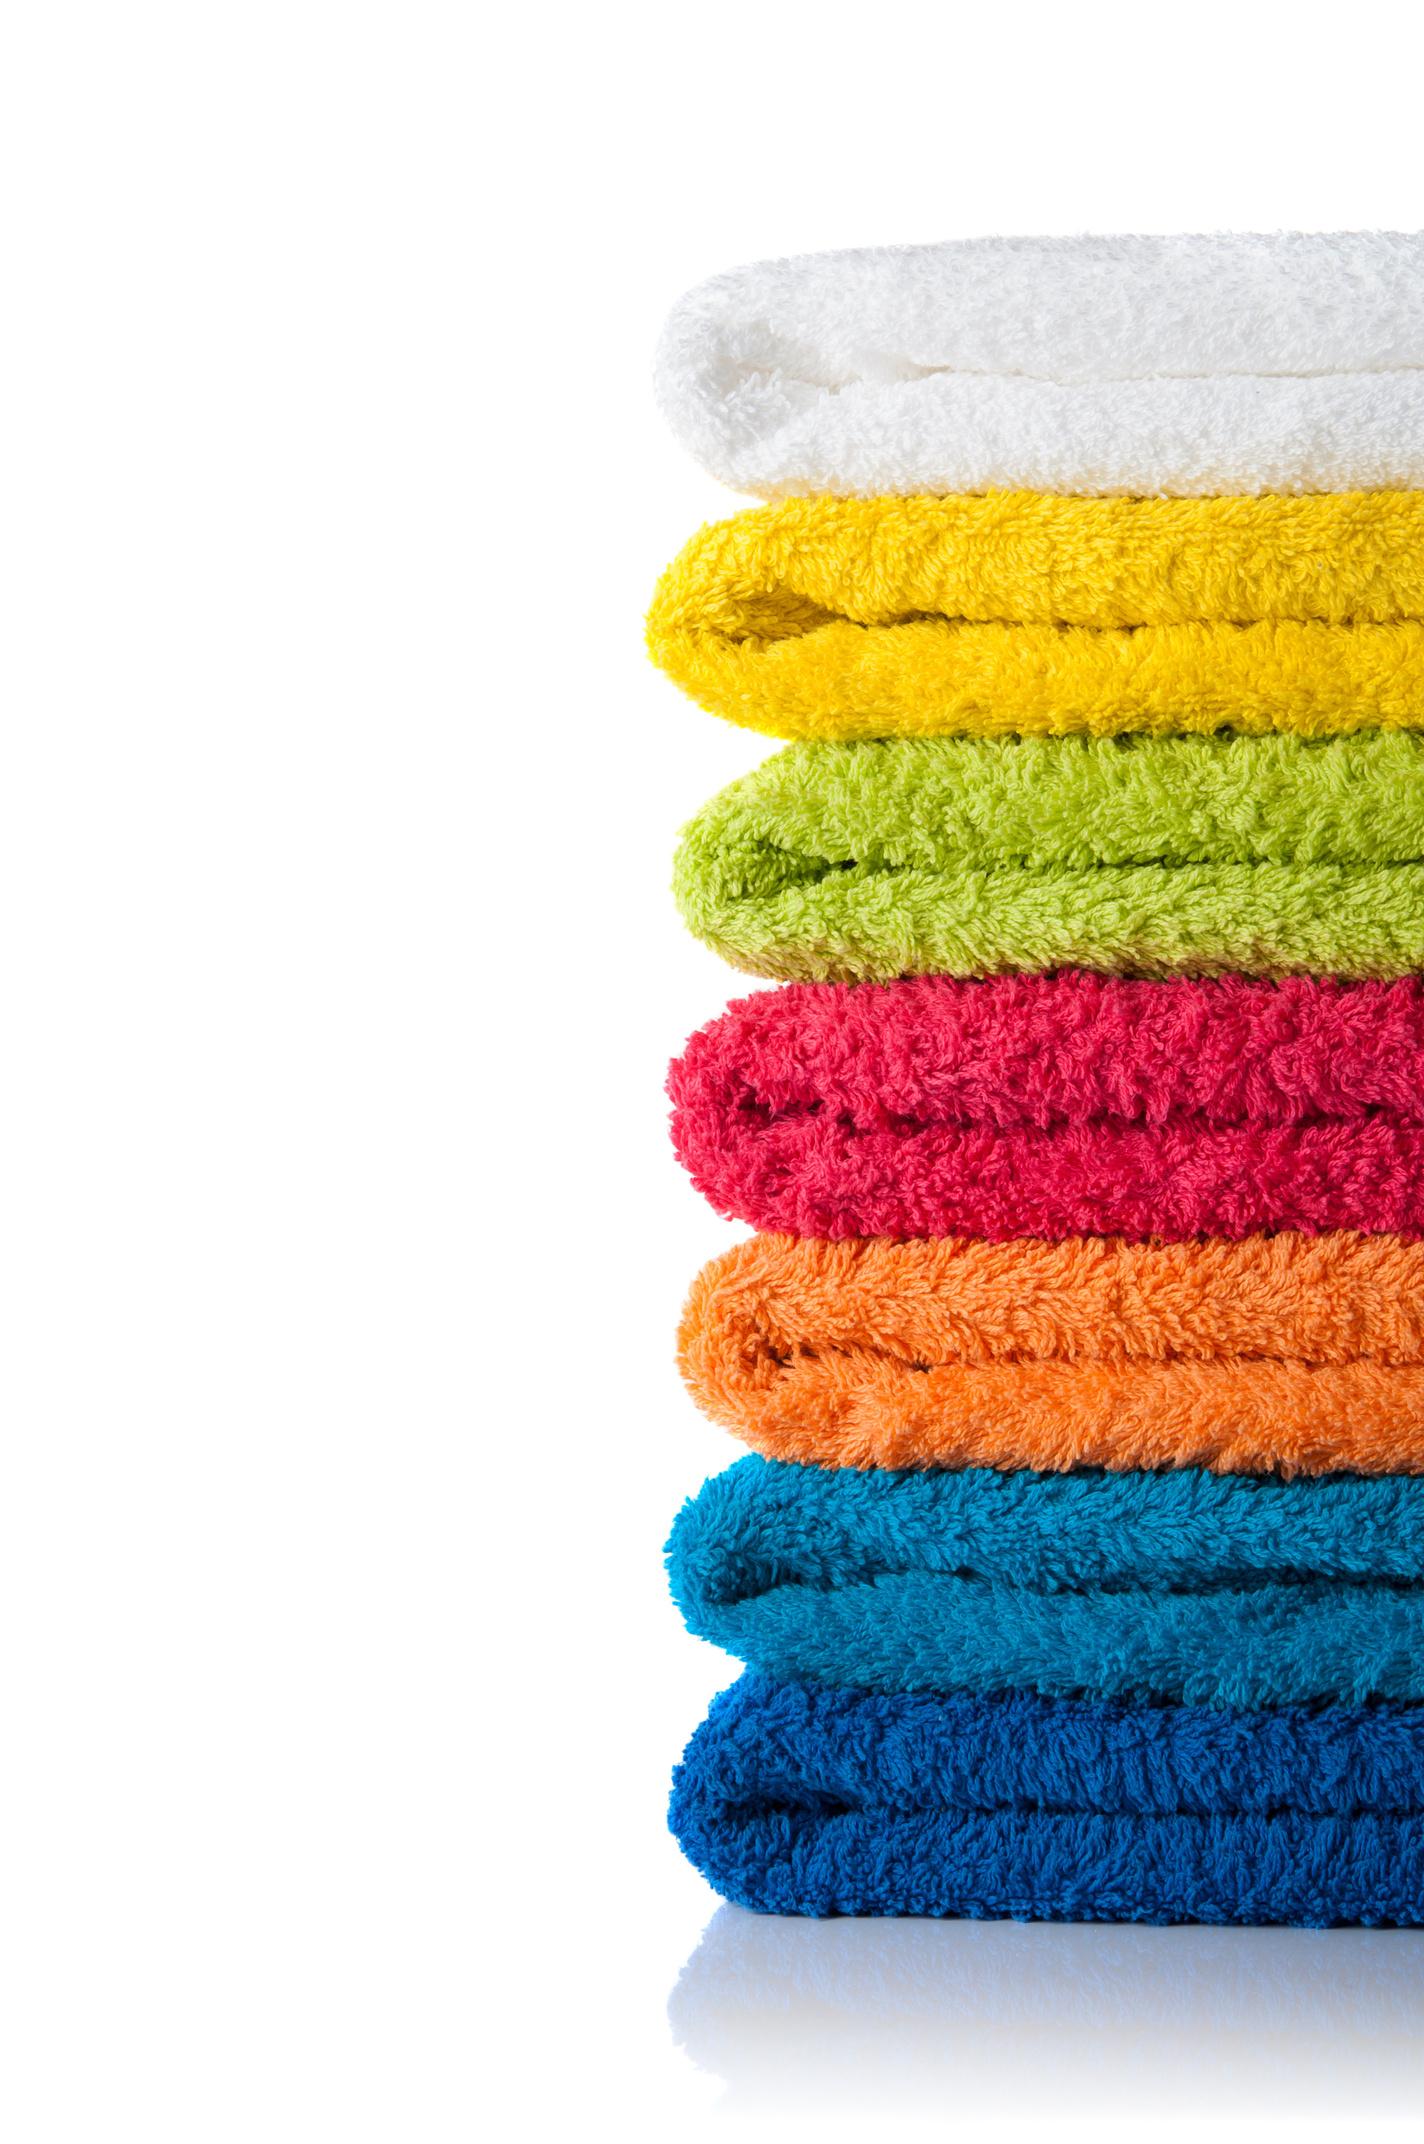 20 Laundry Hacks You Totally Need